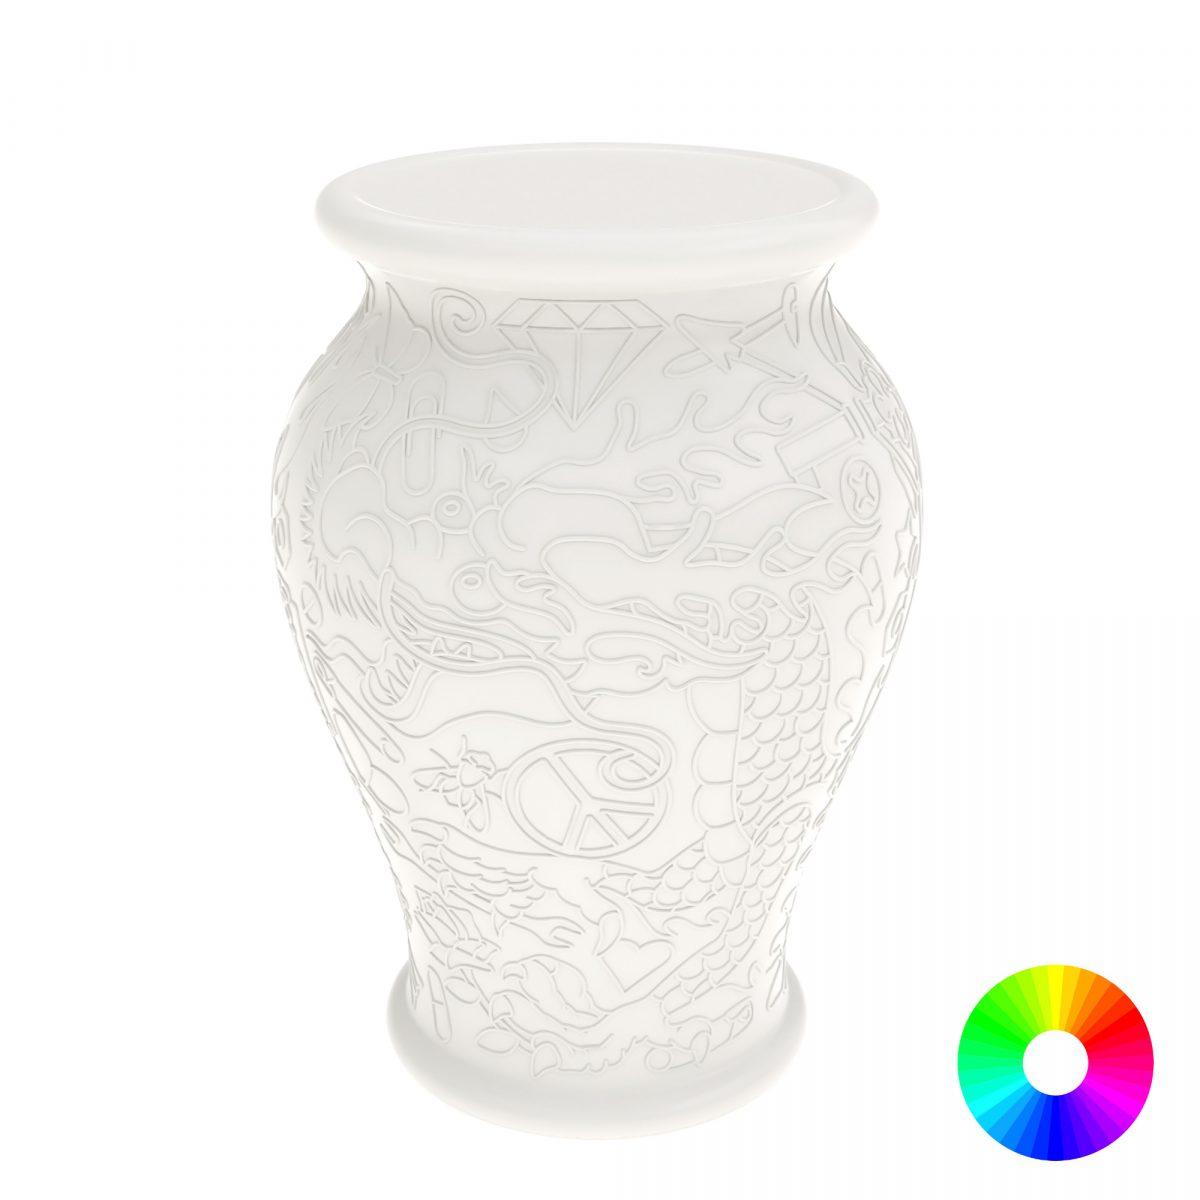 Ming vase LED